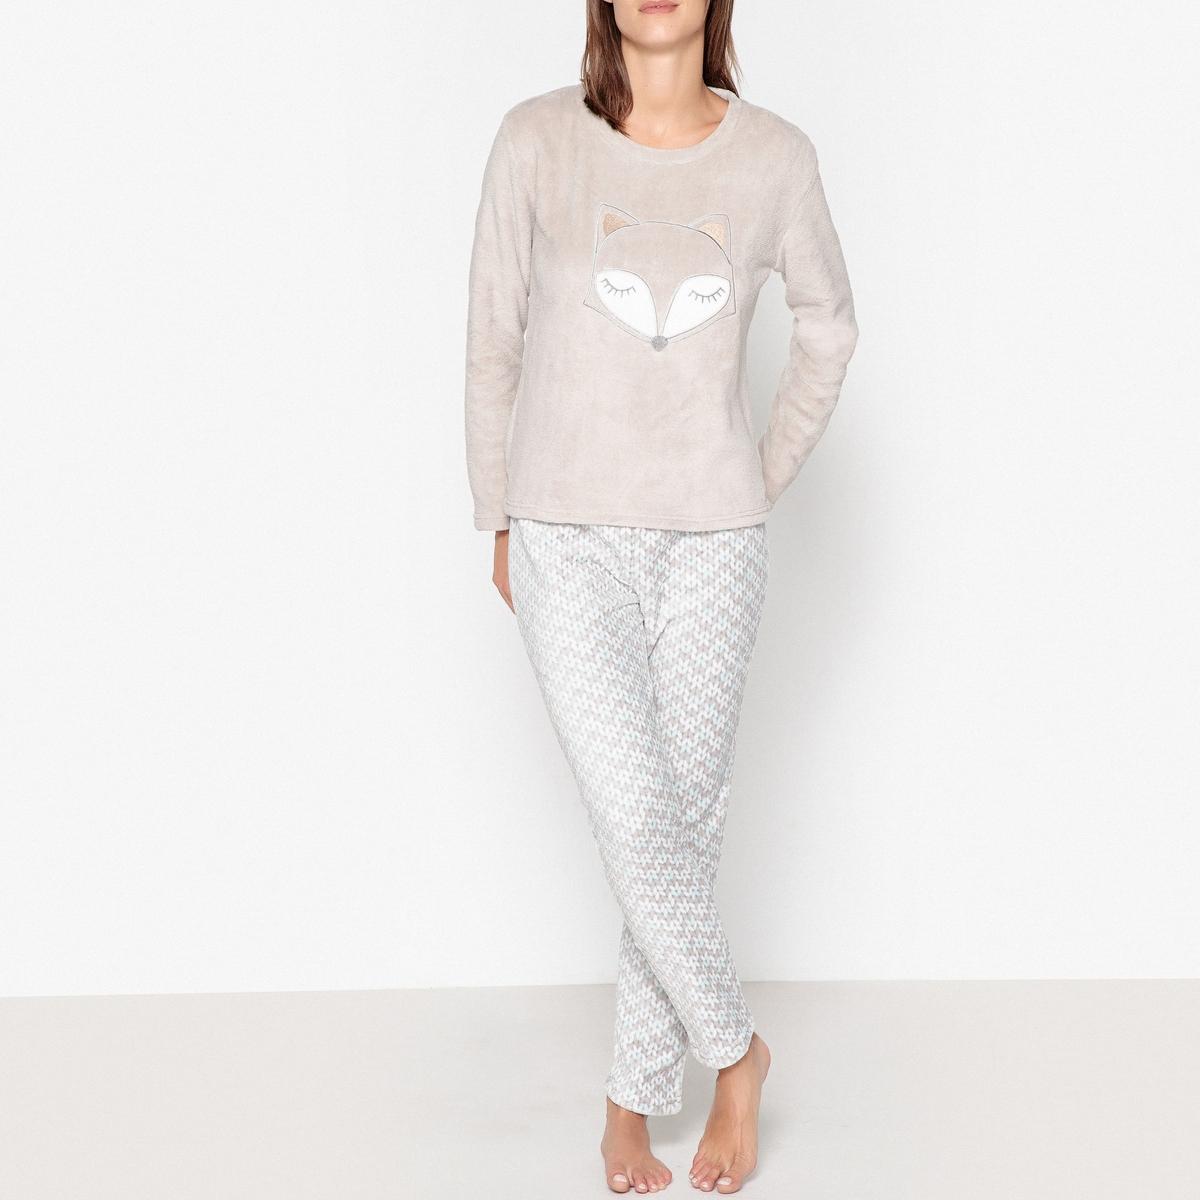 Пижама из велюра с рисунком лиса пижама с шортами с рисунком